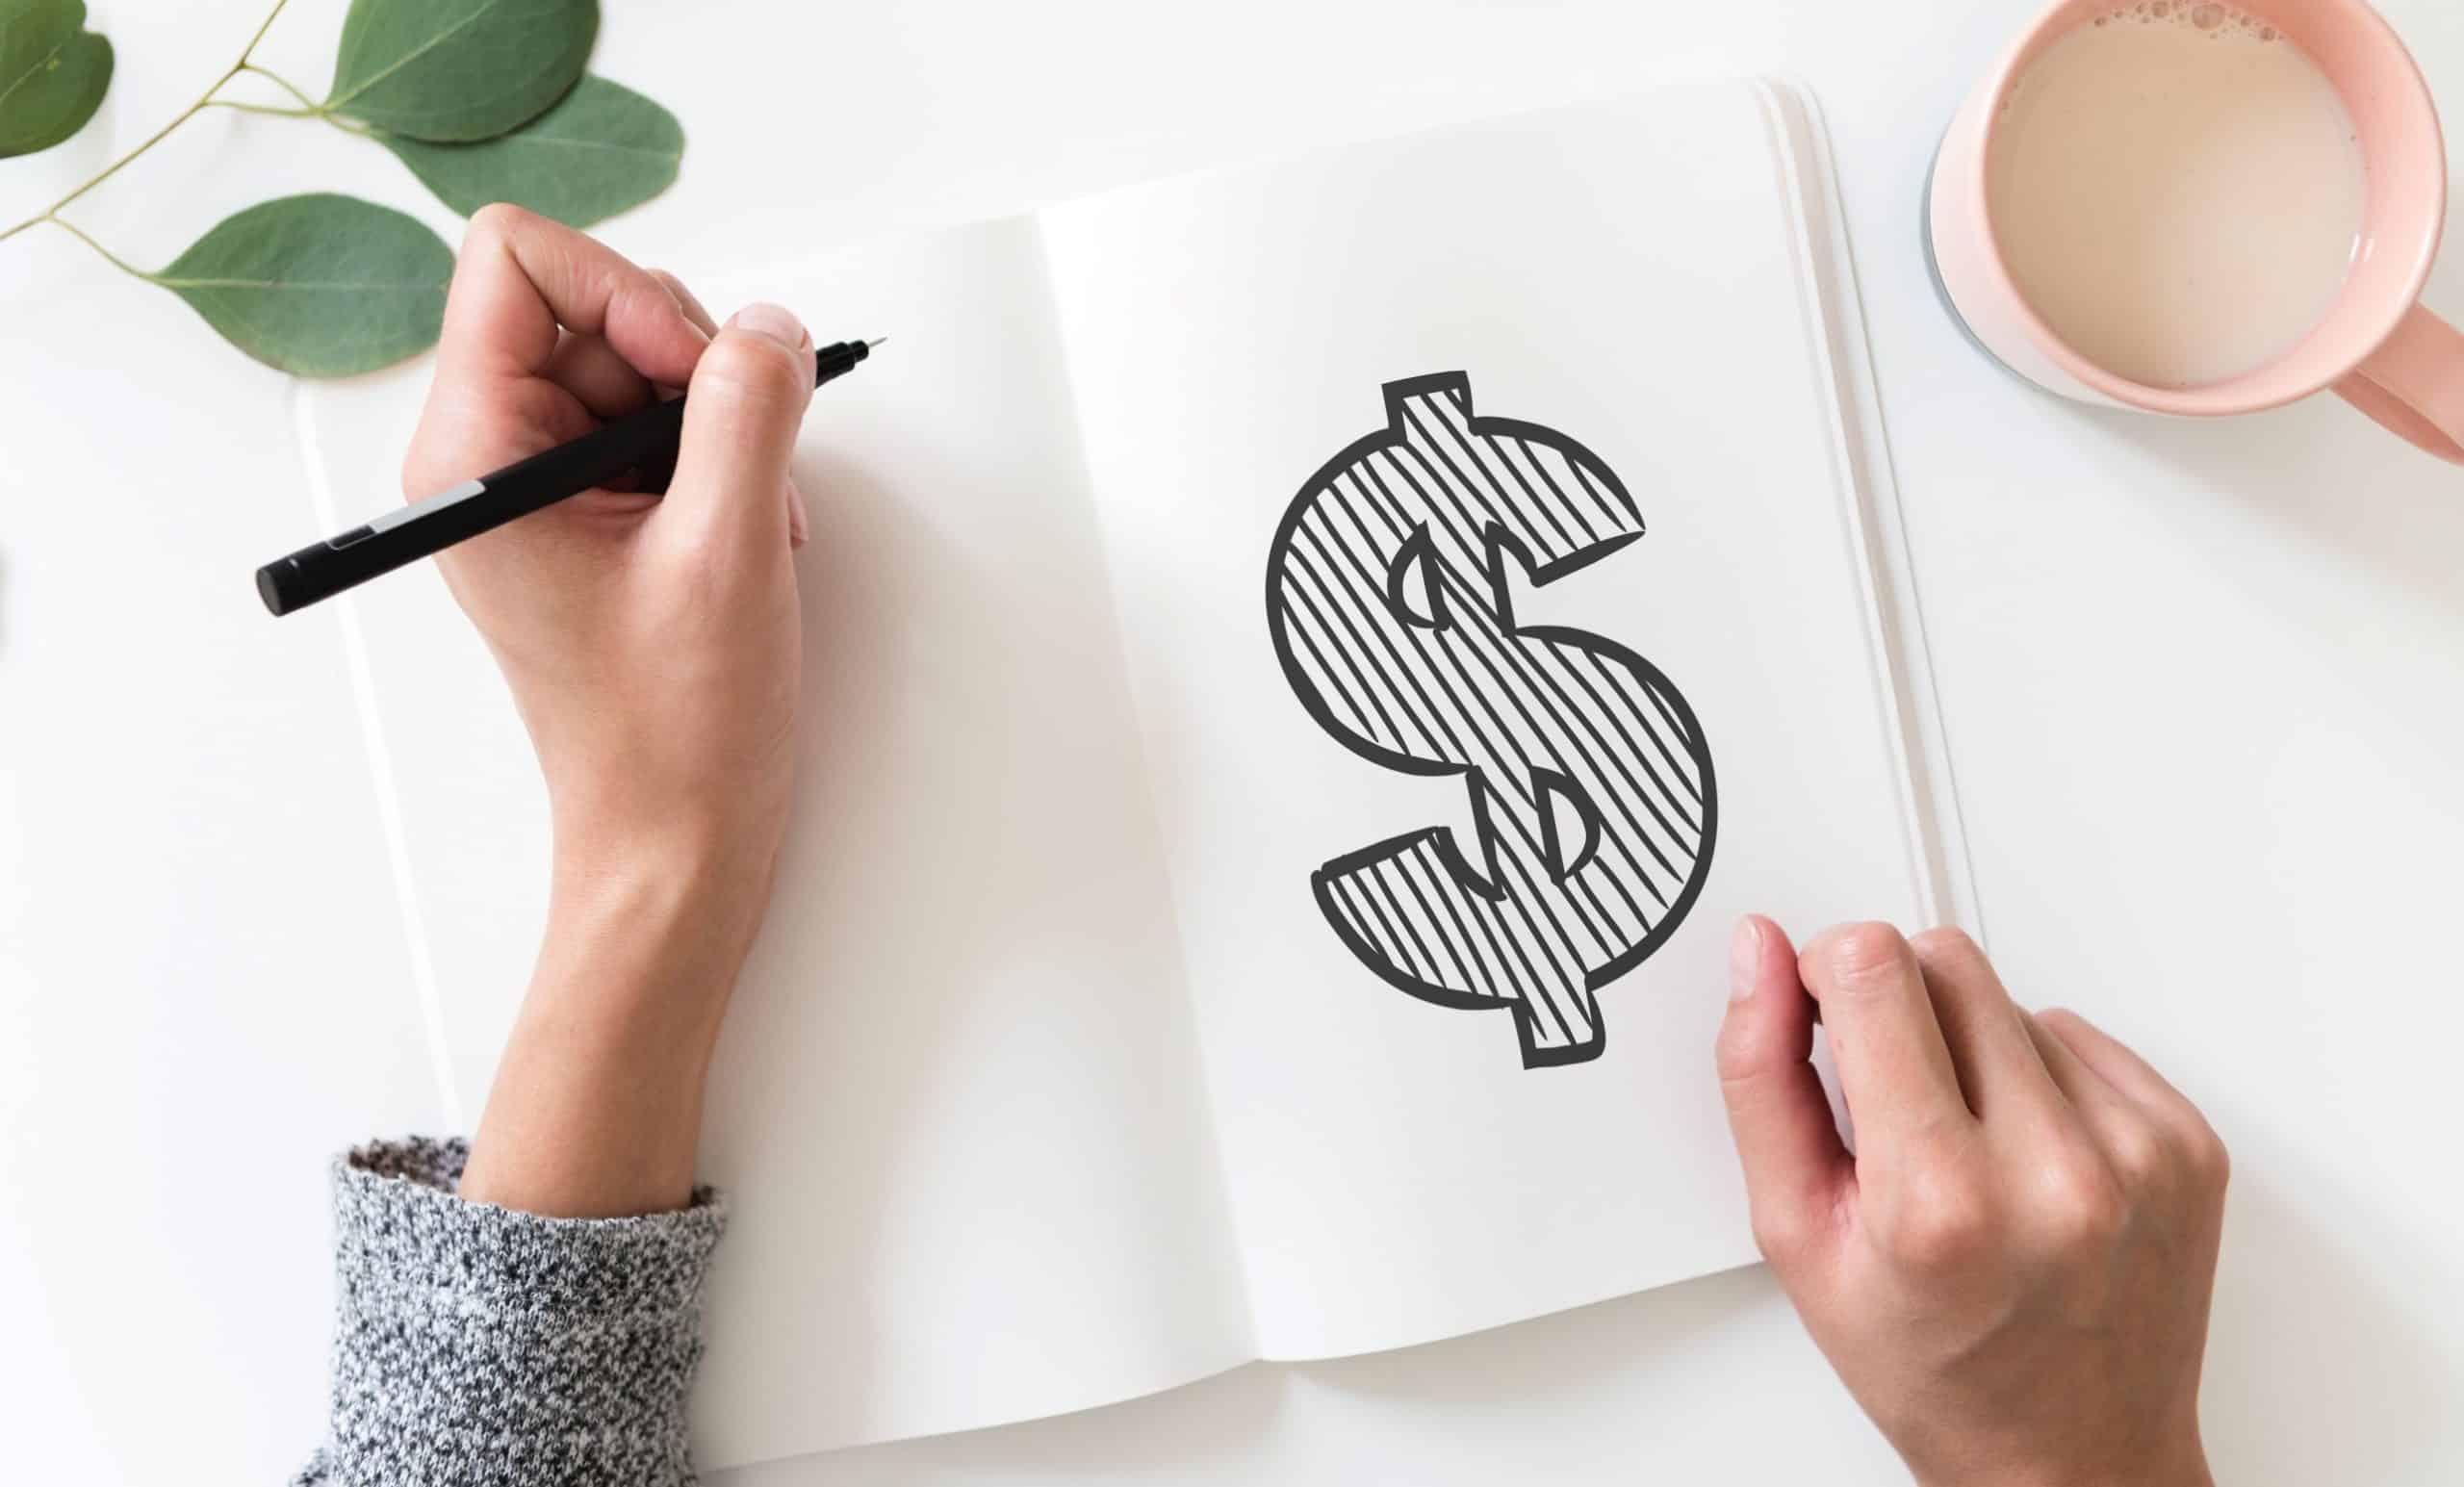 Partica content marketplace helps publishers earn more revenue